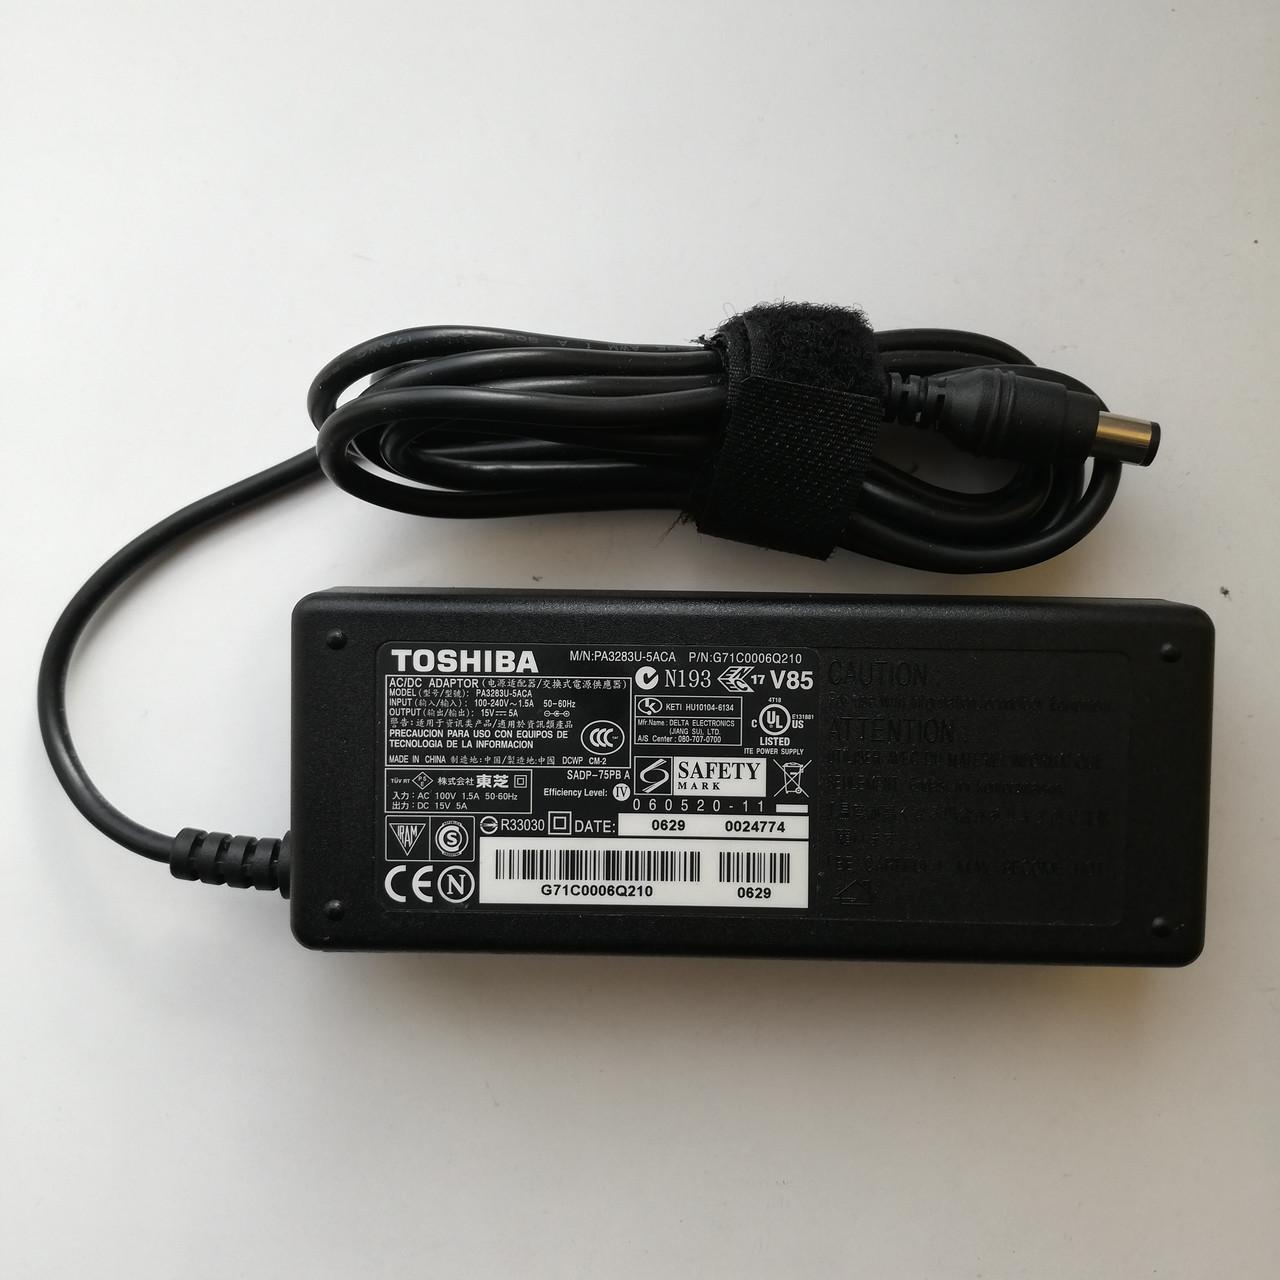 Блок питания Toshiba 75W 15V 5A 060520-11 (PA3283U-5ACA) Б/У